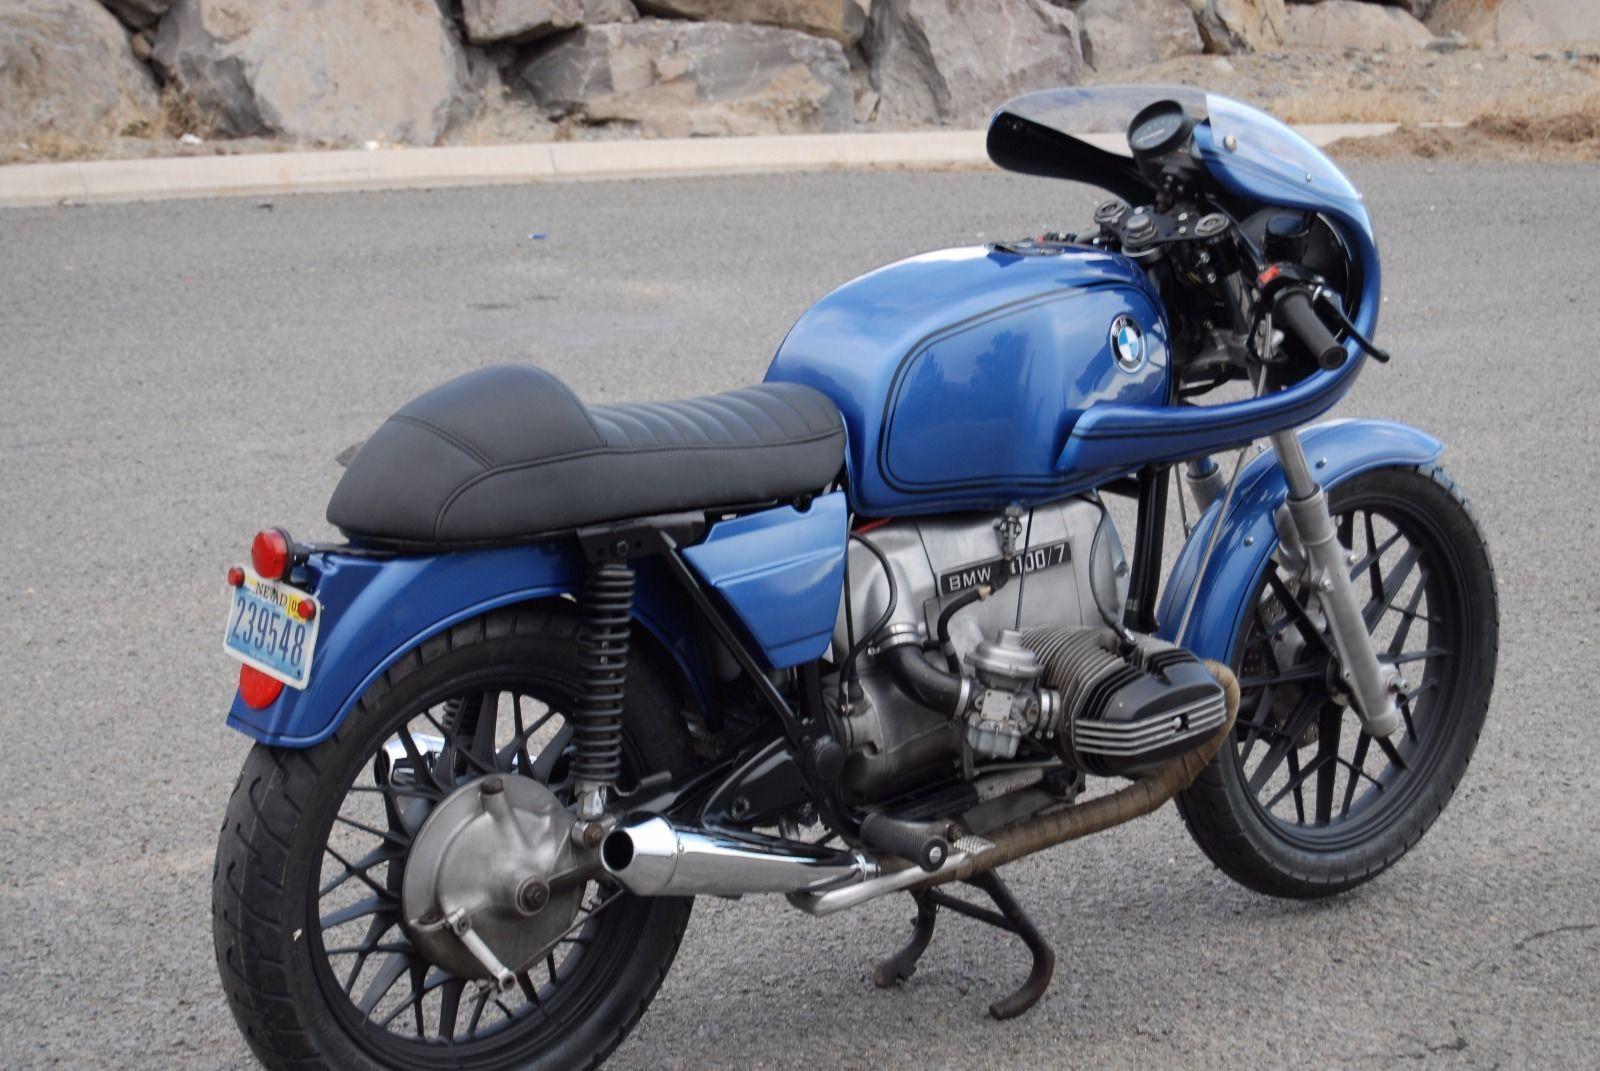 pinjames on bmw cycle | pinterest | custom motorcycles, bmw